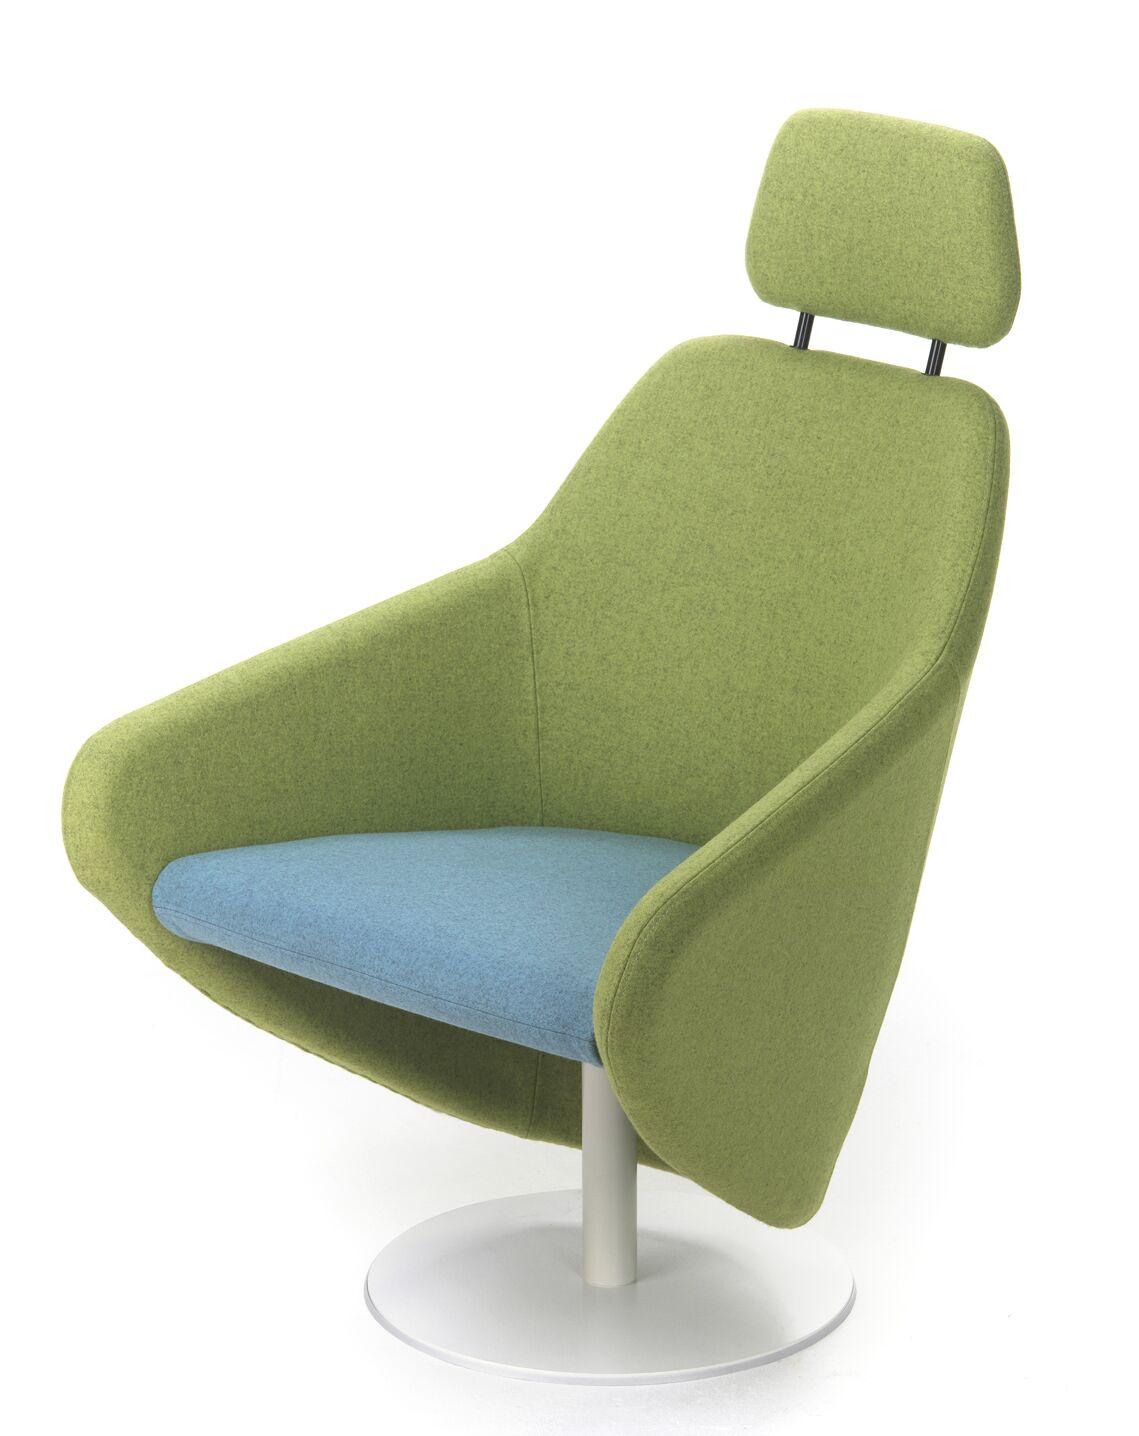 Taxido Swivel Lounge Chair with Headrest Finish: Anthracite, Upholstery: Momentum Beeline Vinyl Eucalyptus